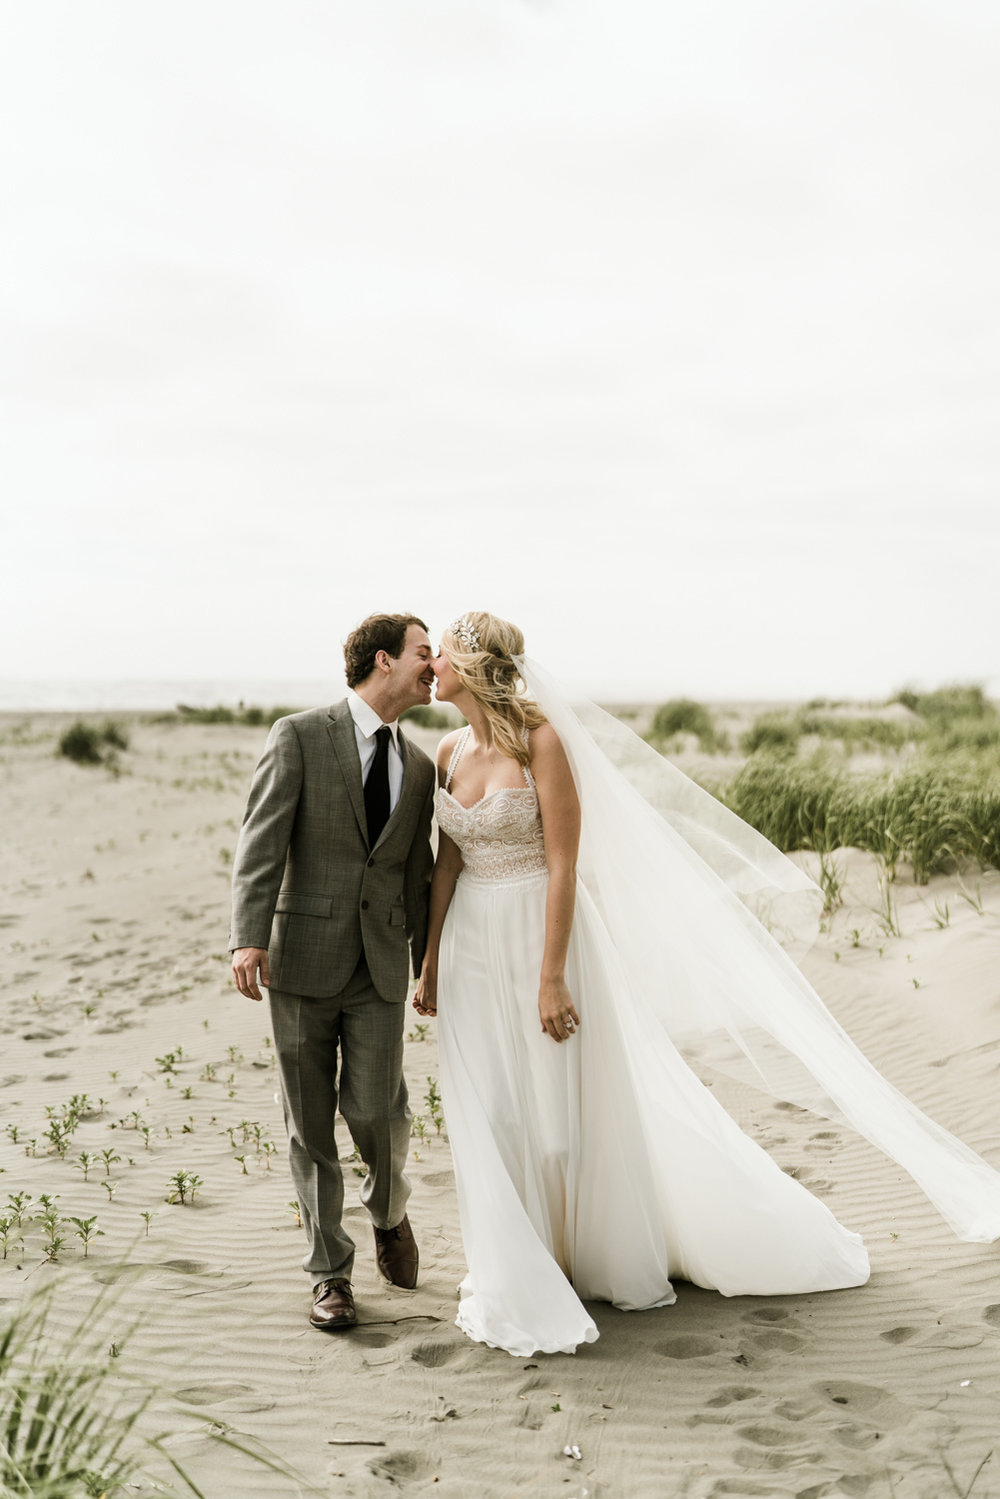 April Yentas Photography - Seabrook Shoot-73.jpg